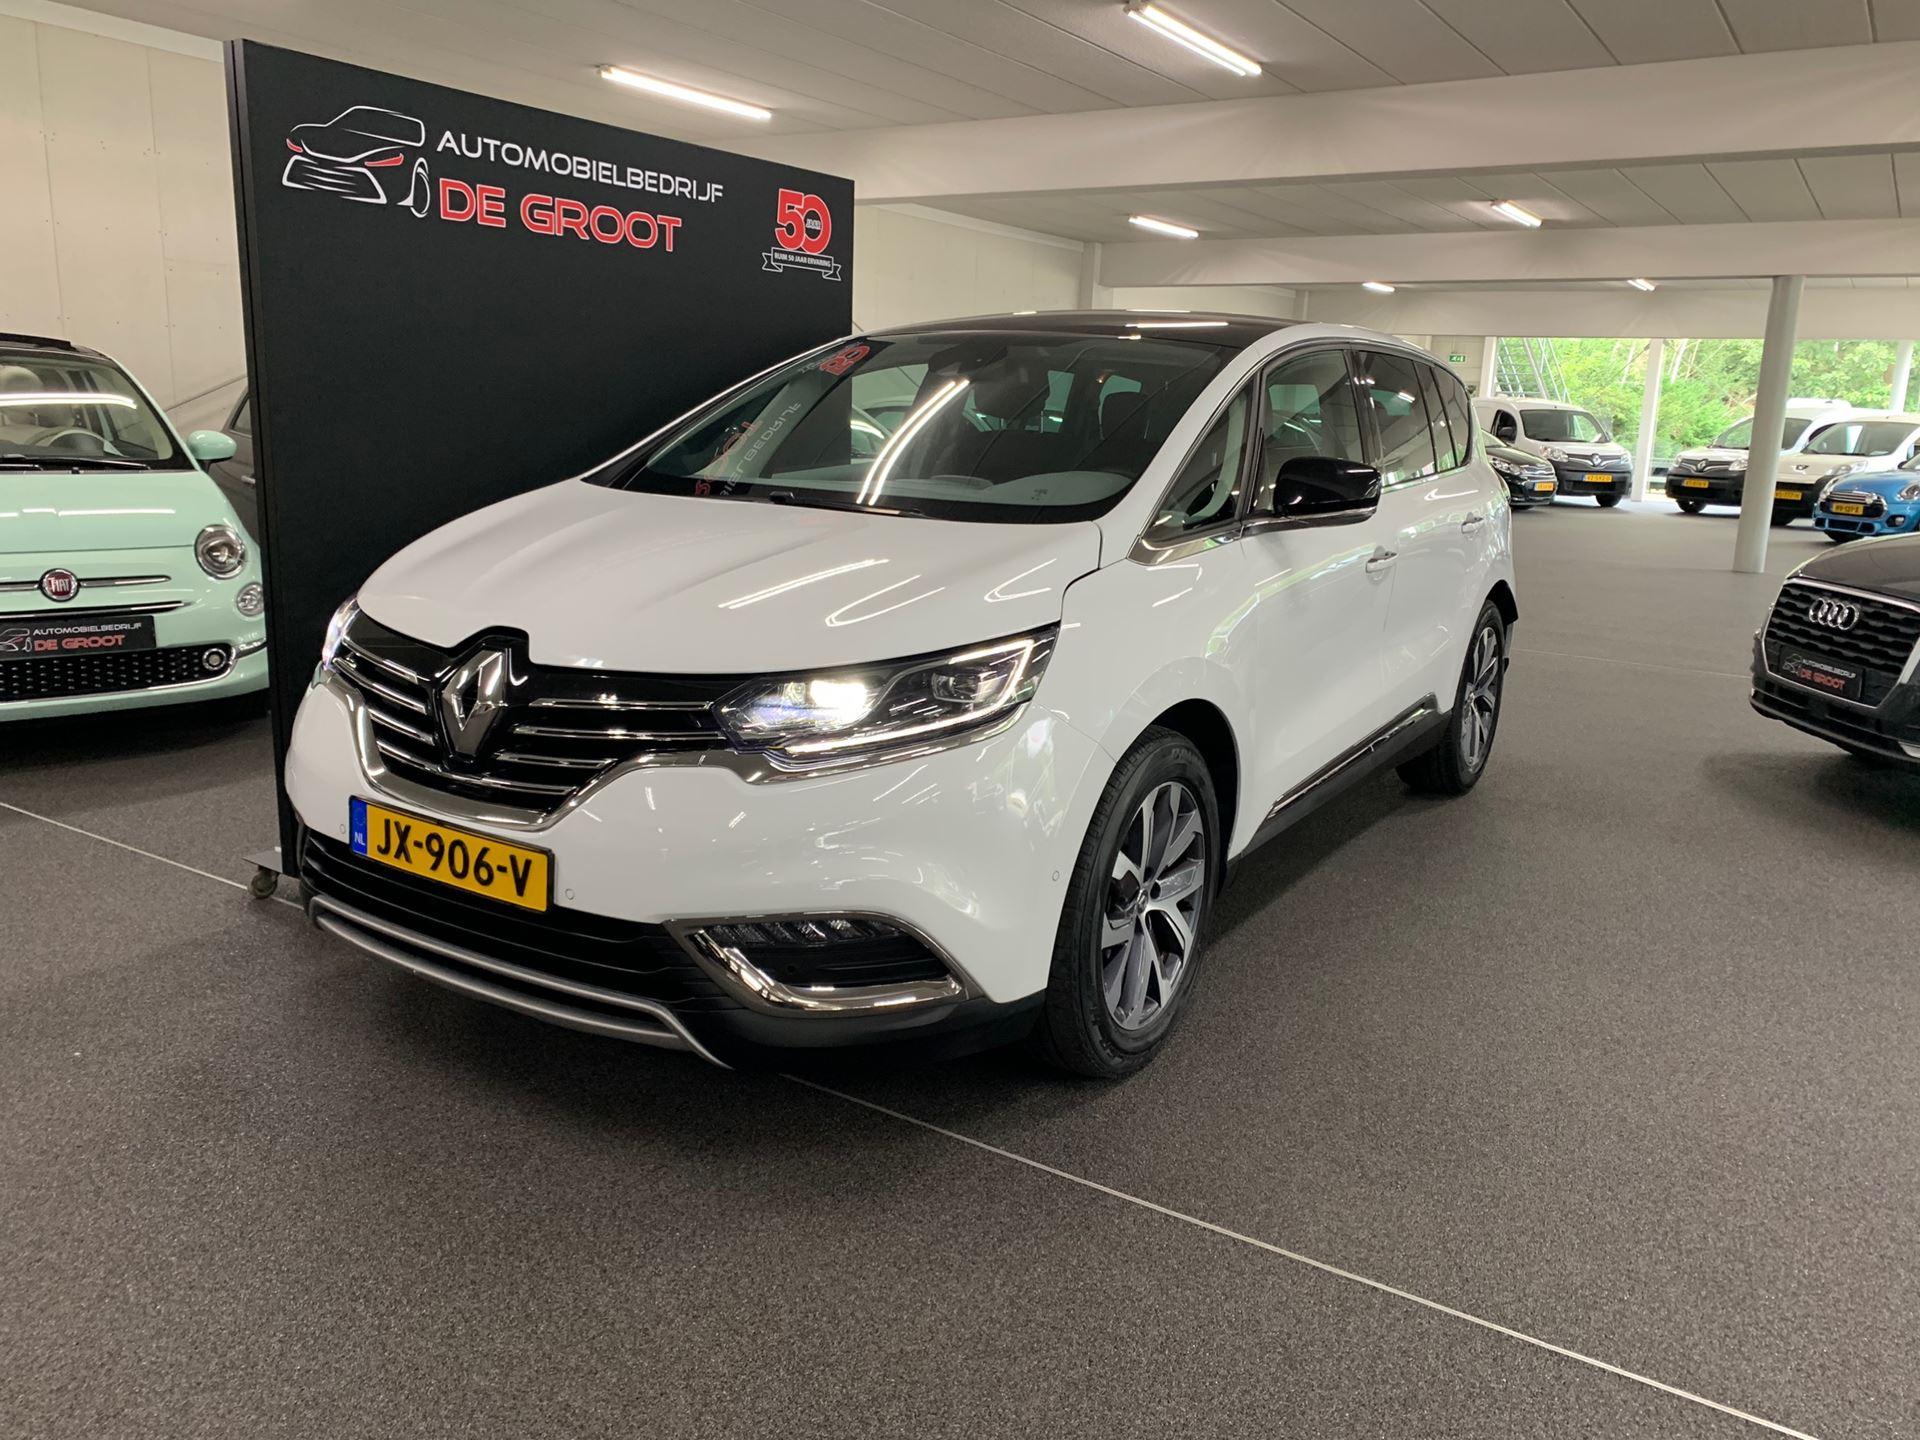 Renault Espace occasion - Automobielbedrijf de Groot